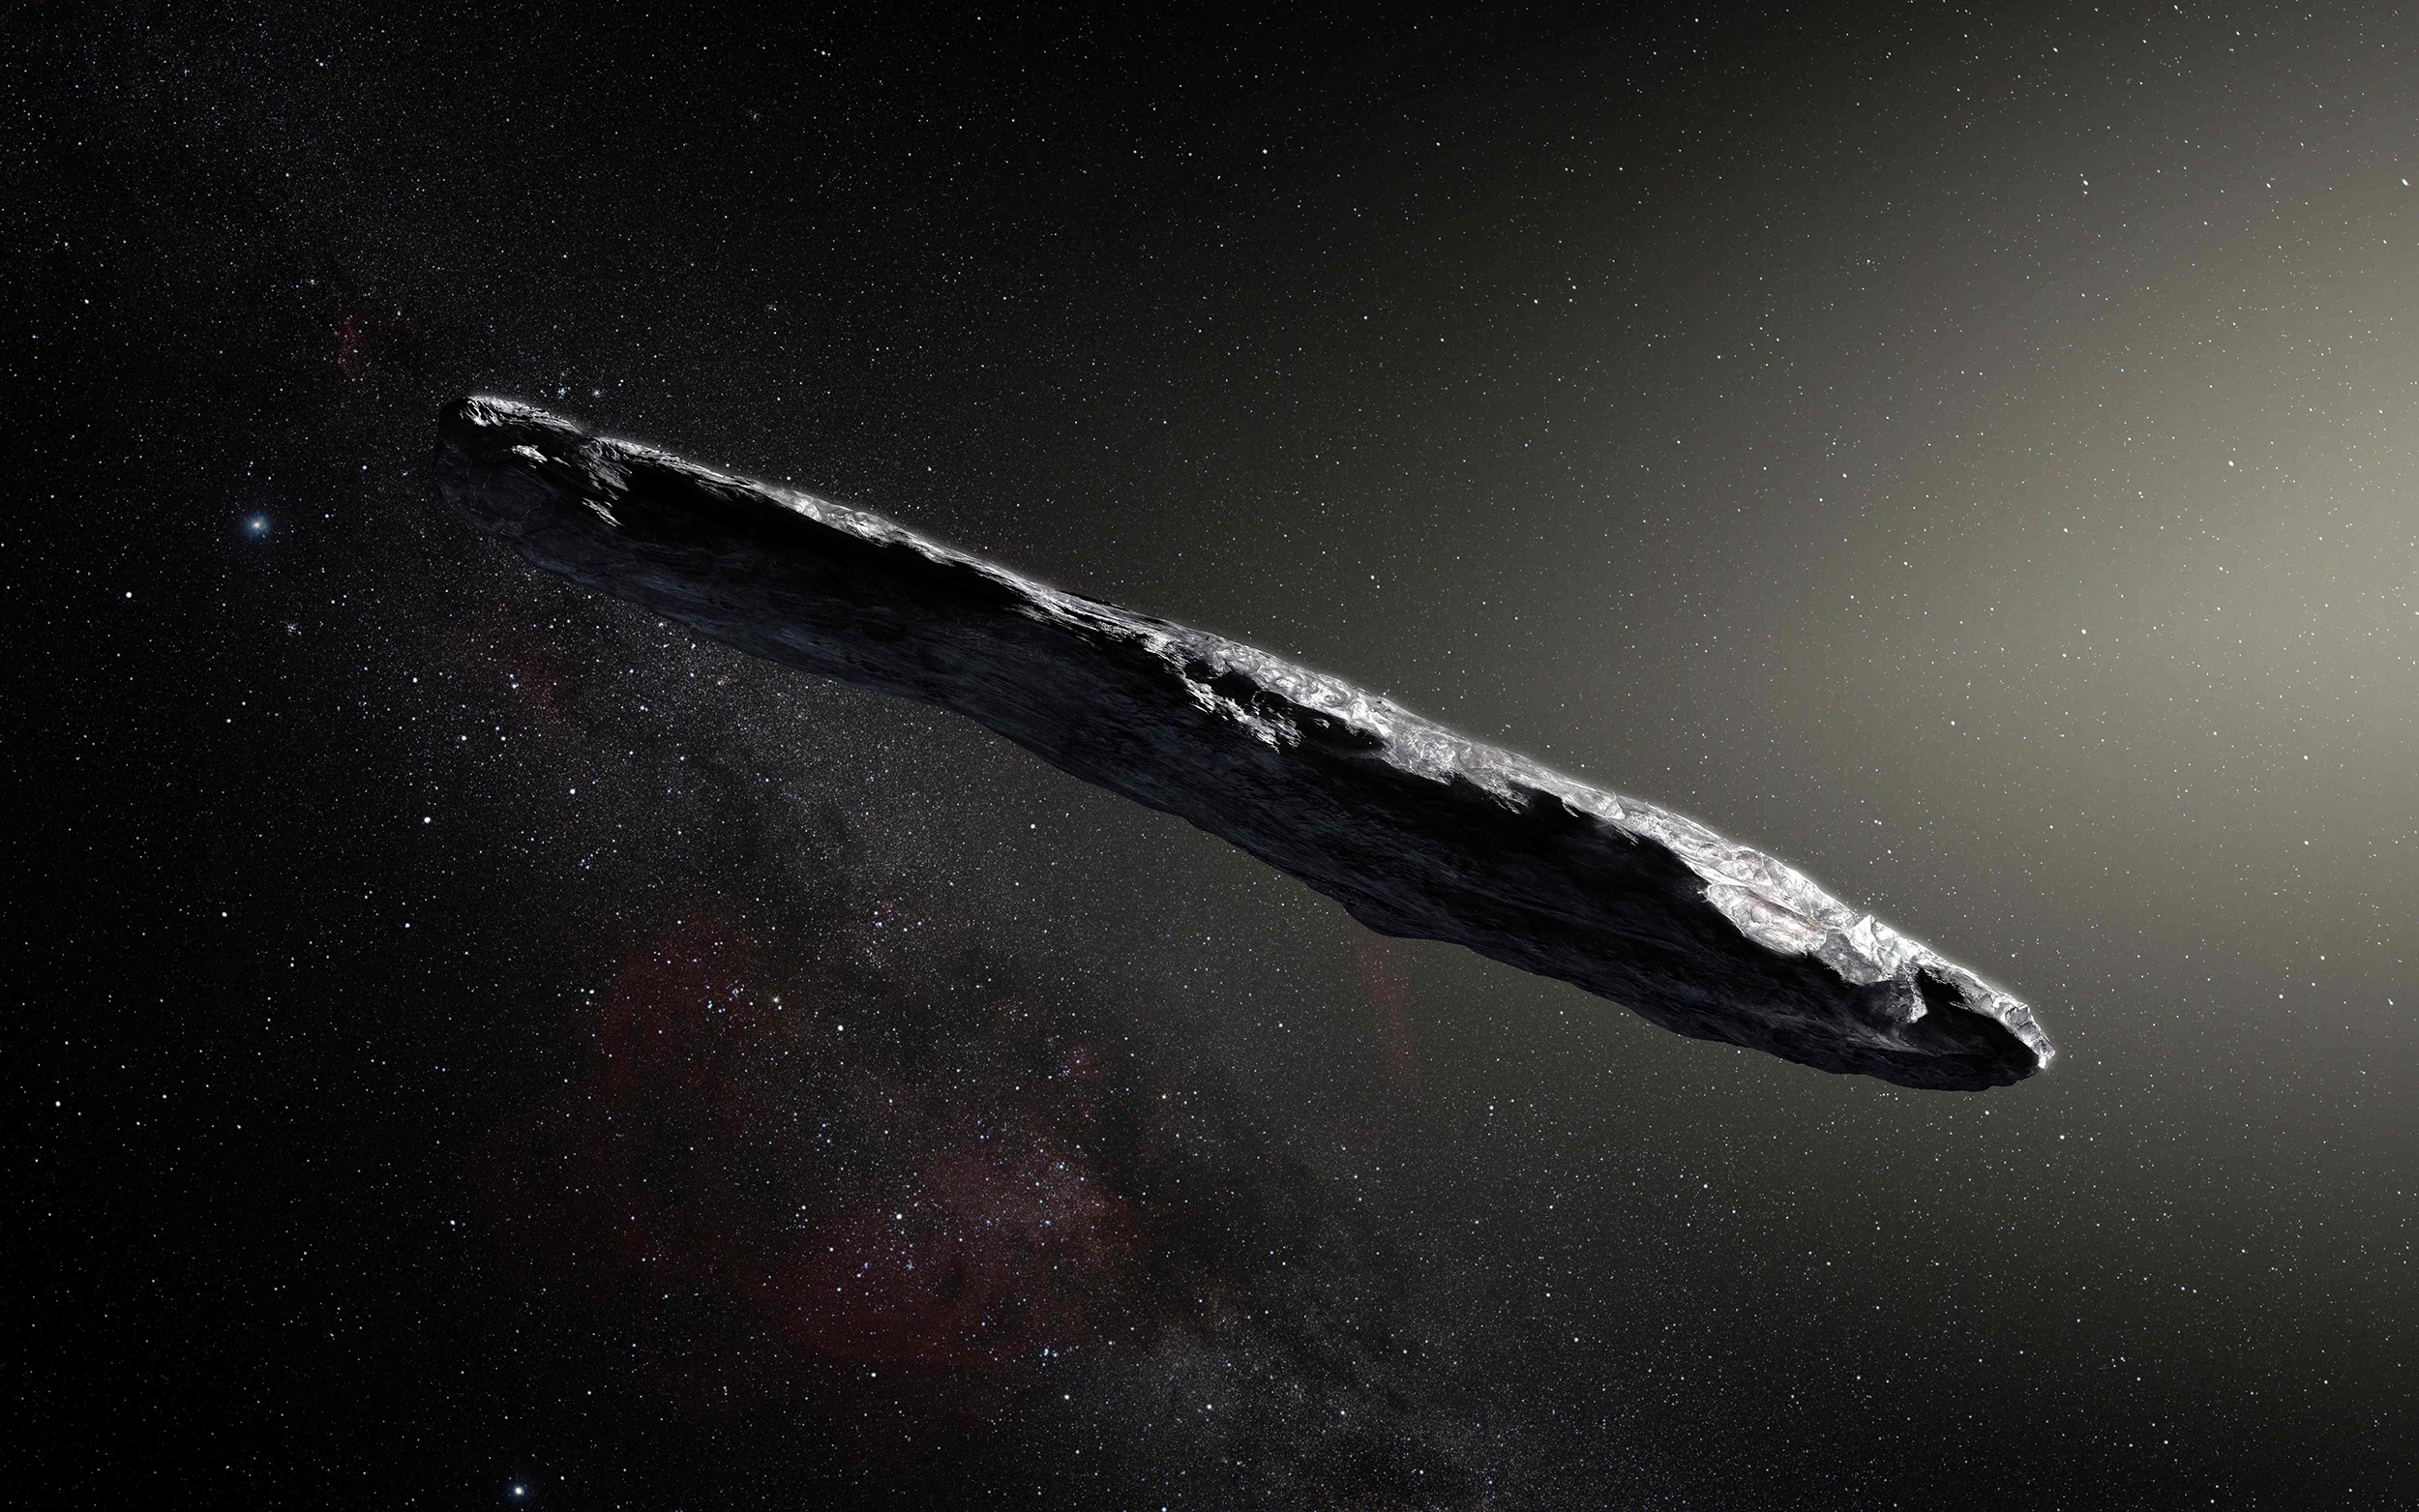 171212-oumuamua-ac-621p_9d41cefd67beebc93c18a75244ead796.jpg